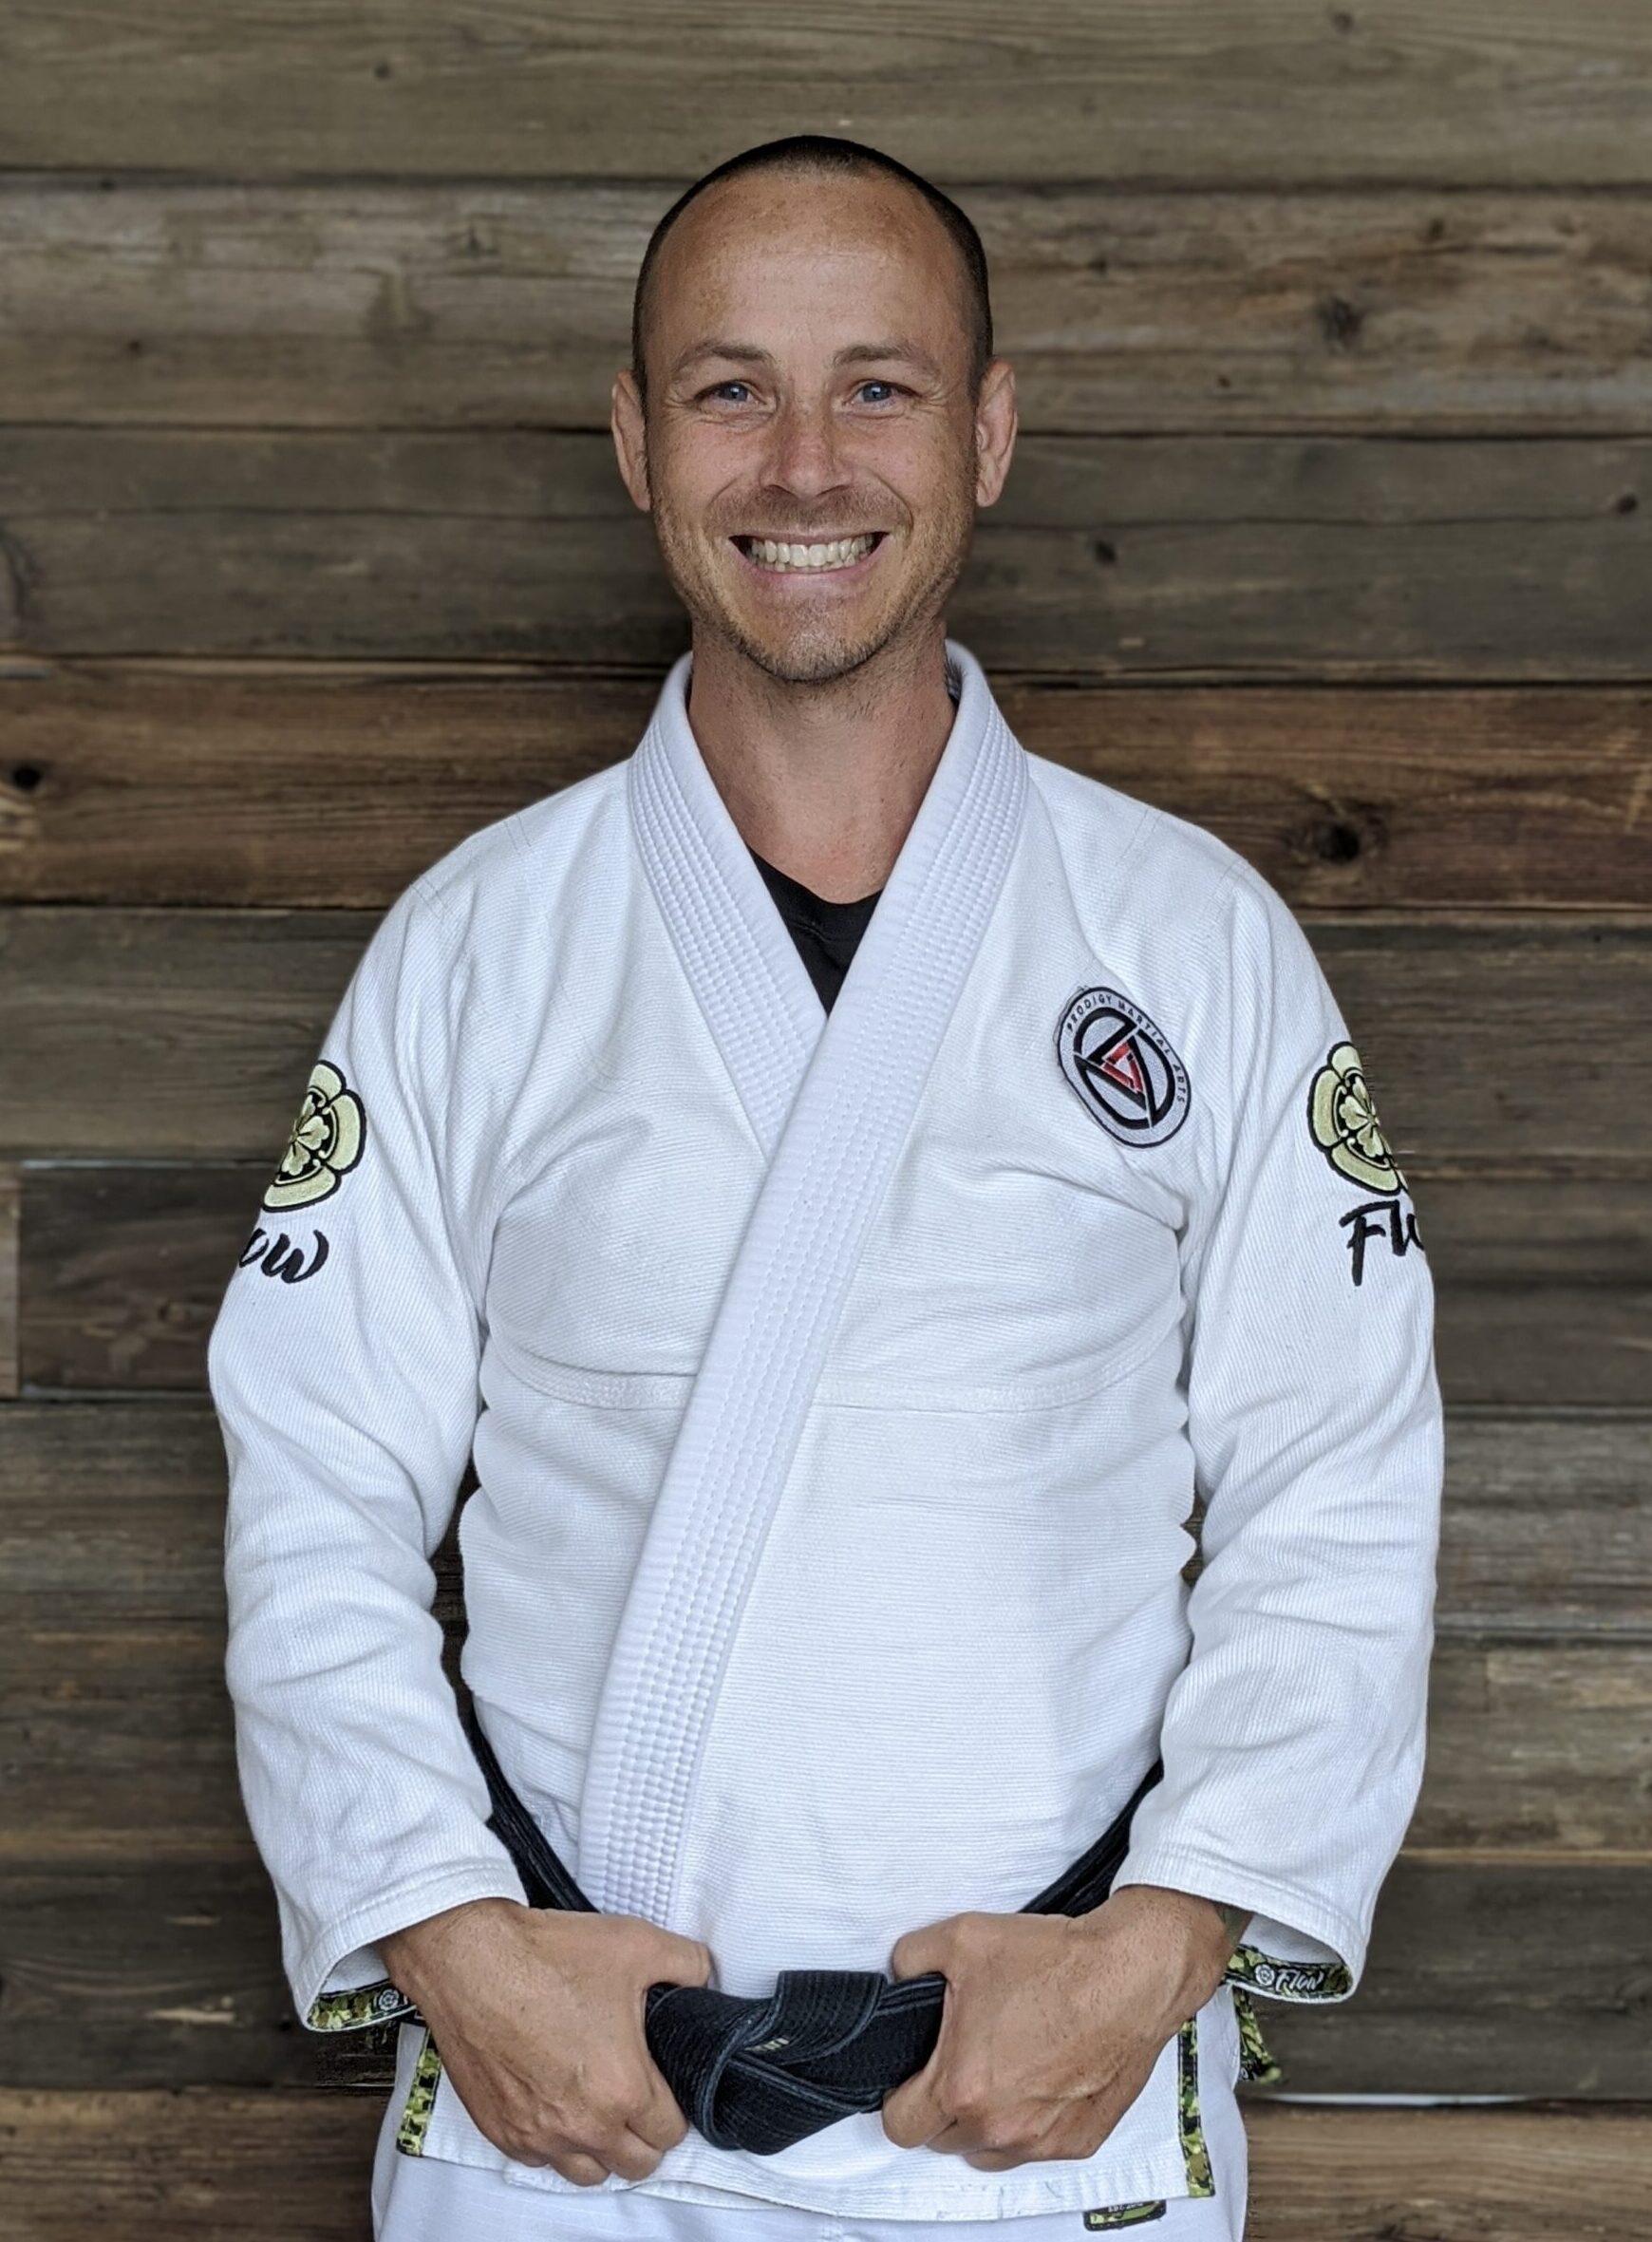 Professor Justin Kahmann posing for a picture in a white Jiu-Jitsu gi with his black belt on in Blaine MN